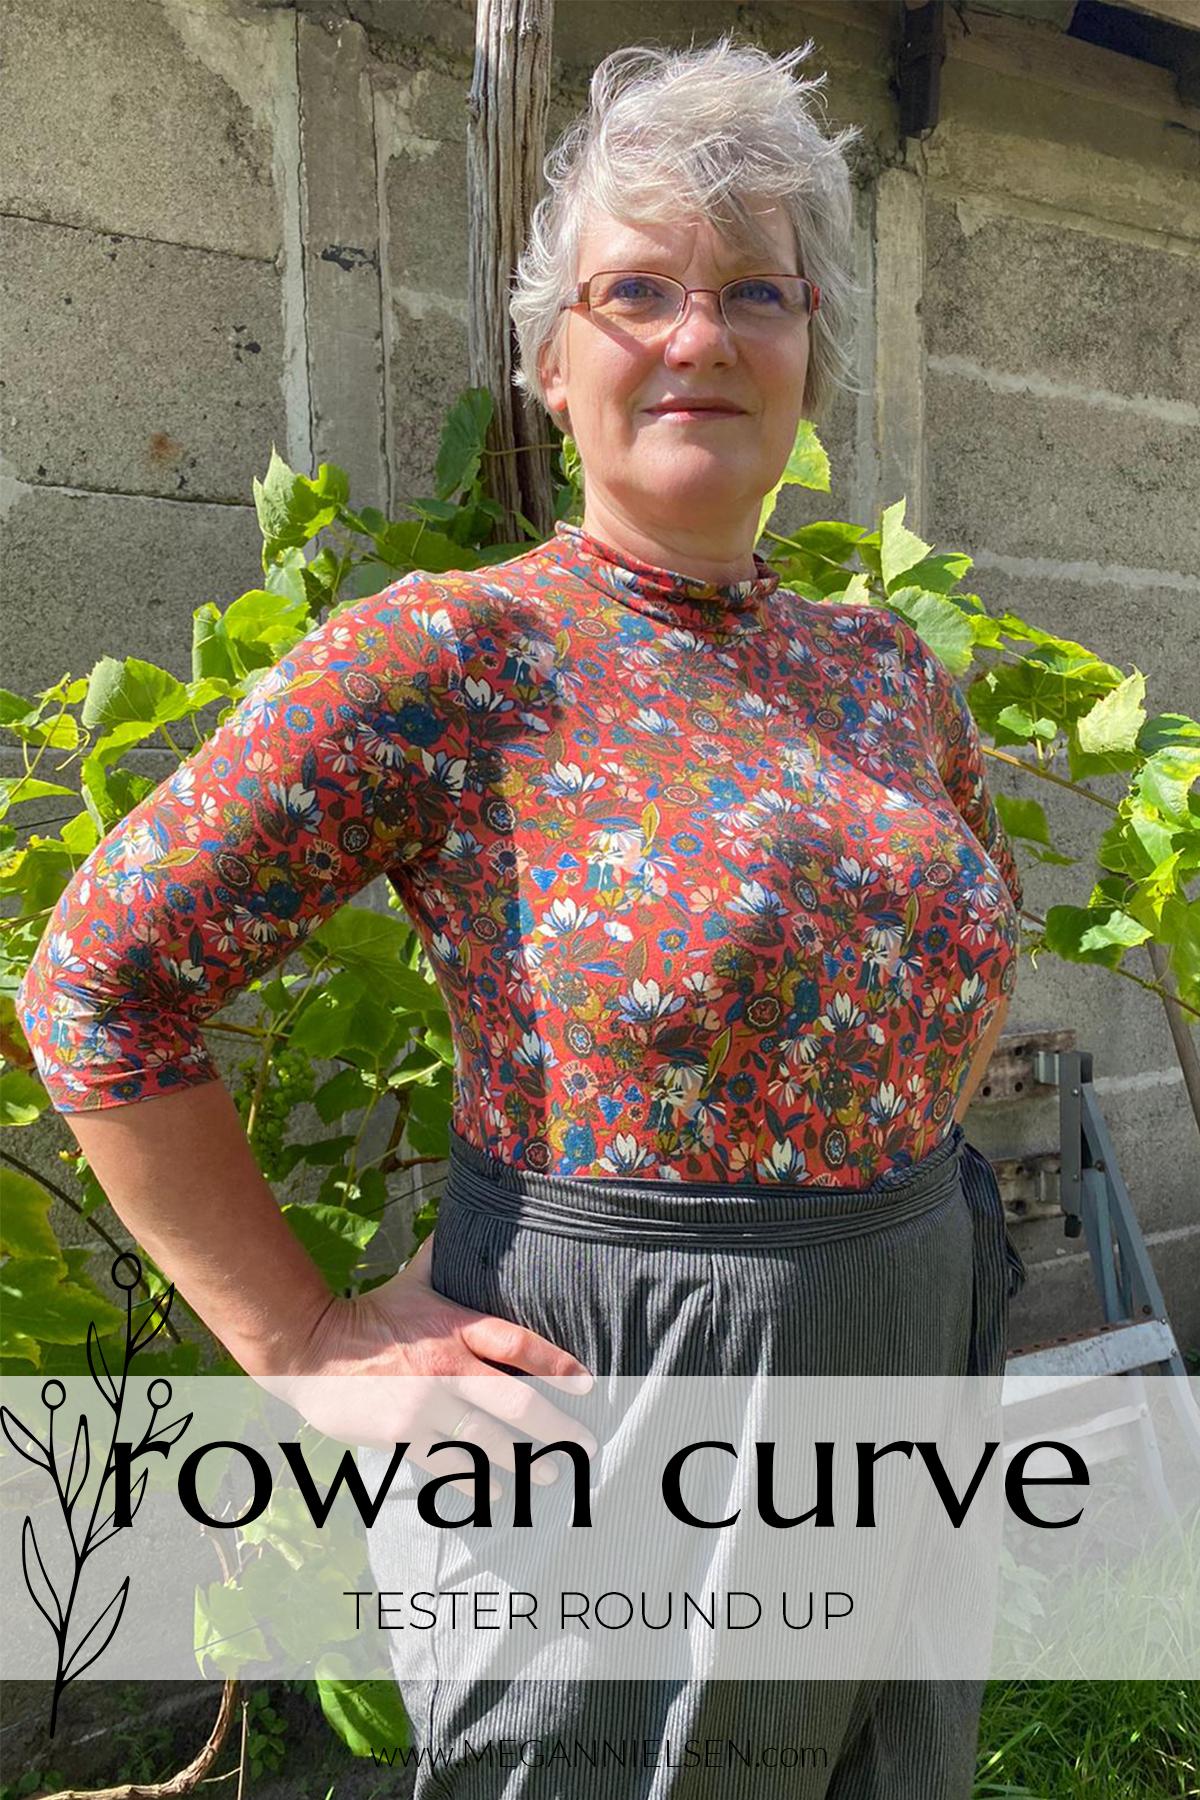 Rowan Curve tester round up